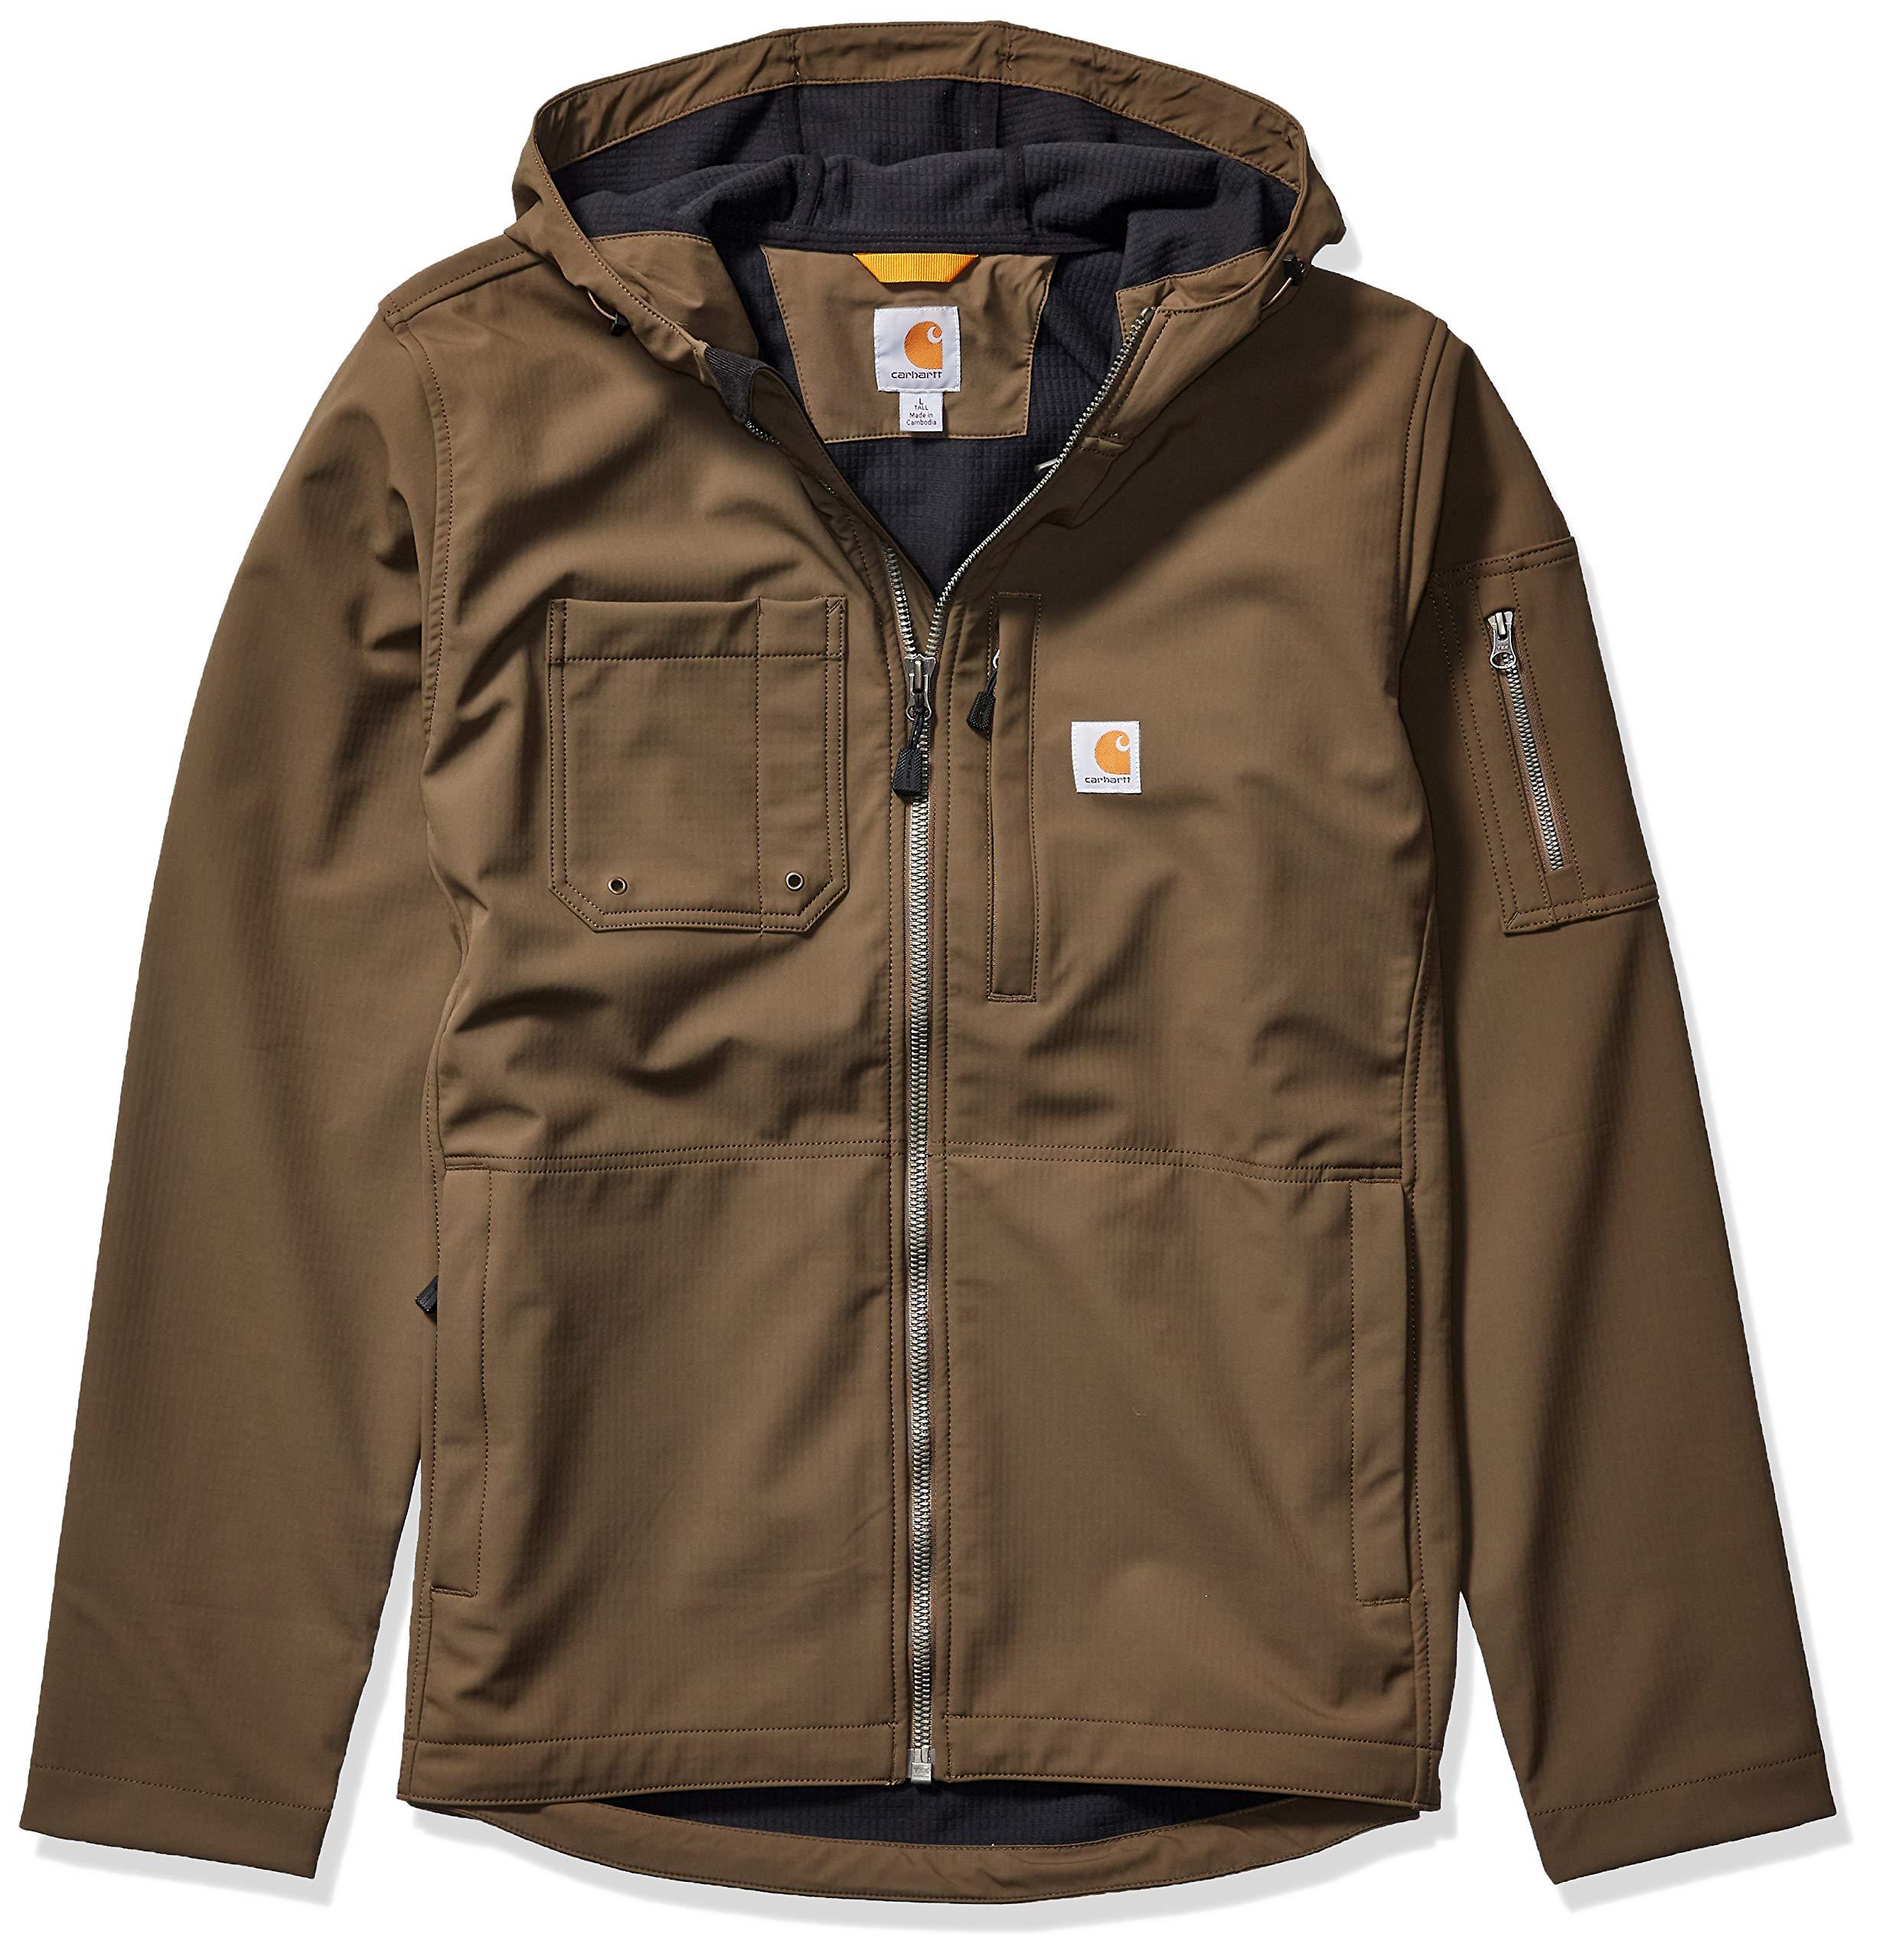 Carhartt Men's Hooded Rough Cut Jacket (Regular and Big & Tall Sizes), Tarmac, Large by Carhartt